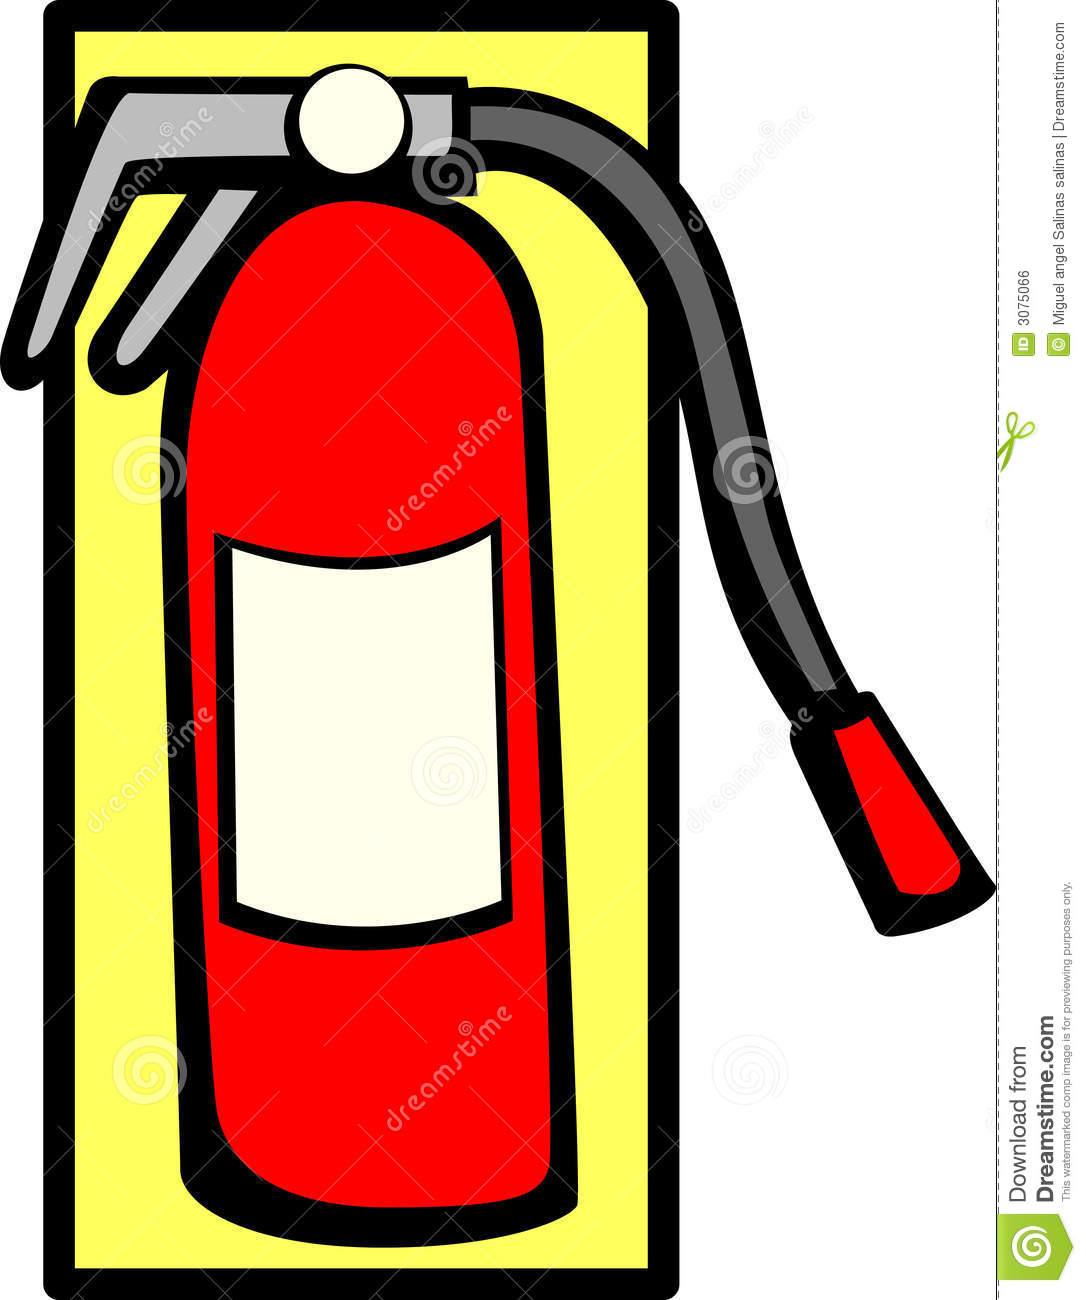 fire extinguisher clip art clipart panda free clipart images rh clipartpanda com cartoon fire extinguisher clipart fire extinguisher clipart png